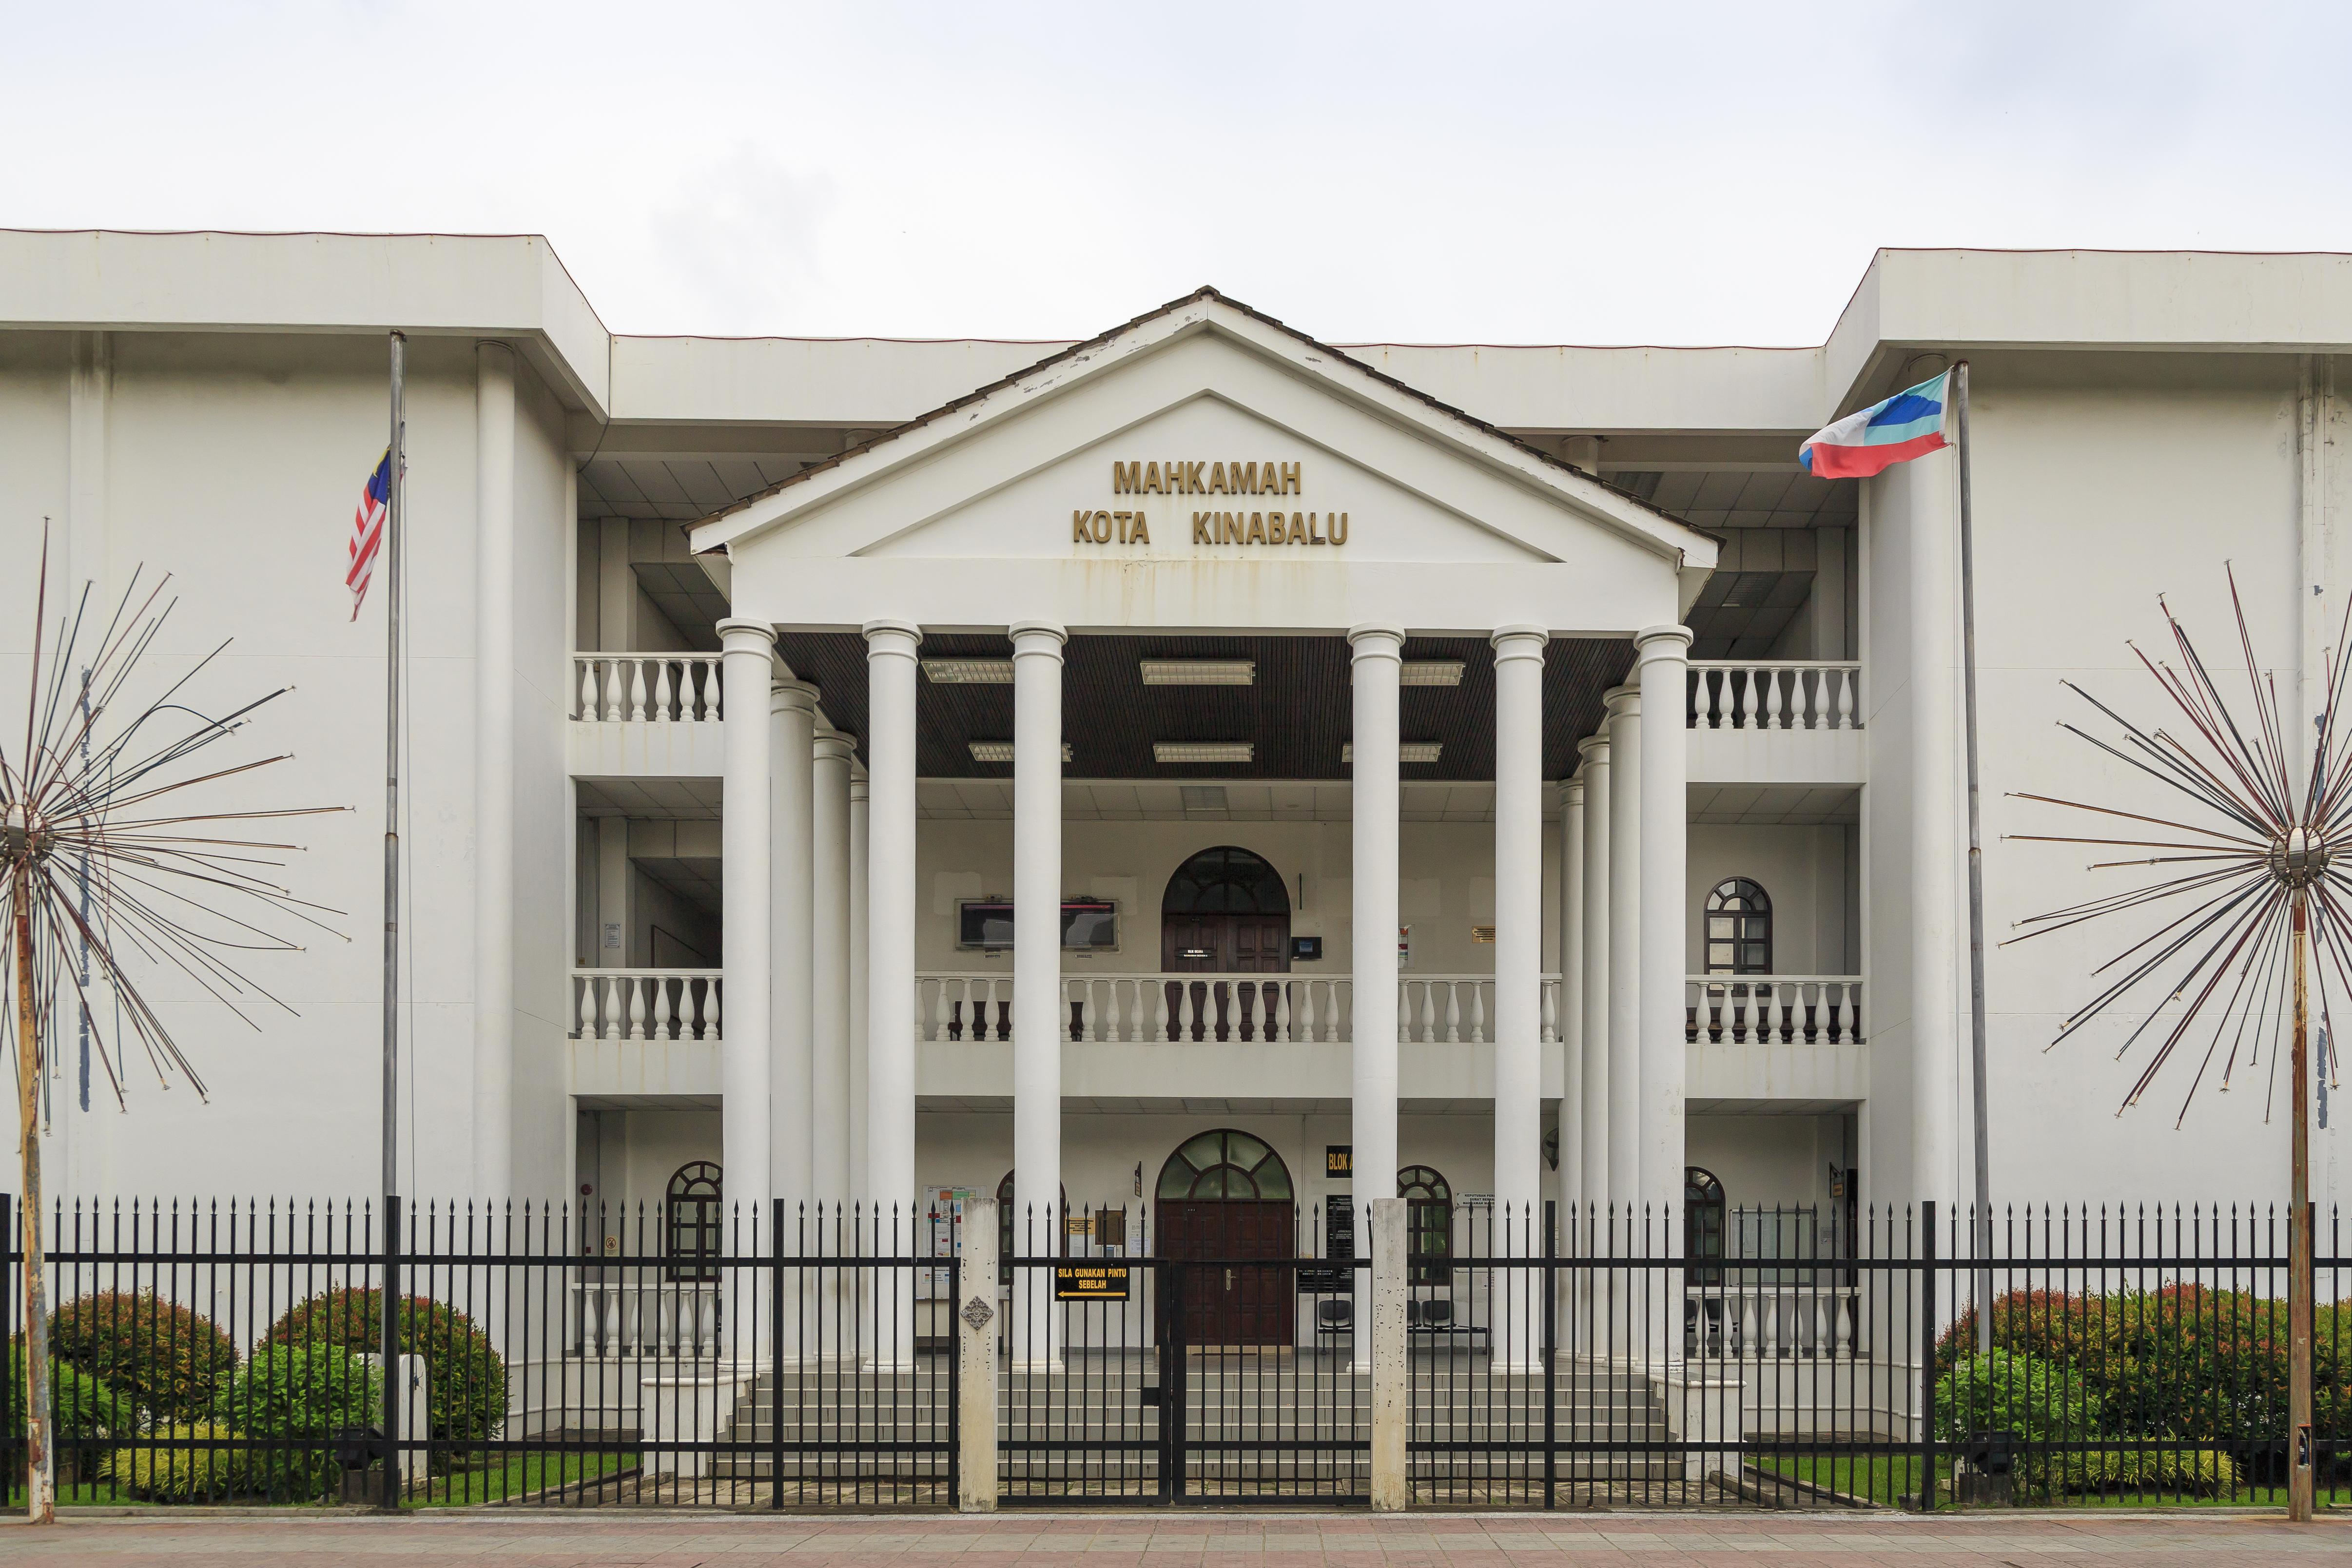 Berkas Kotakinabalu Sabah High Court 01 Jpg Wikipedia Bahasa Indonesia Ensiklopedia Bebas